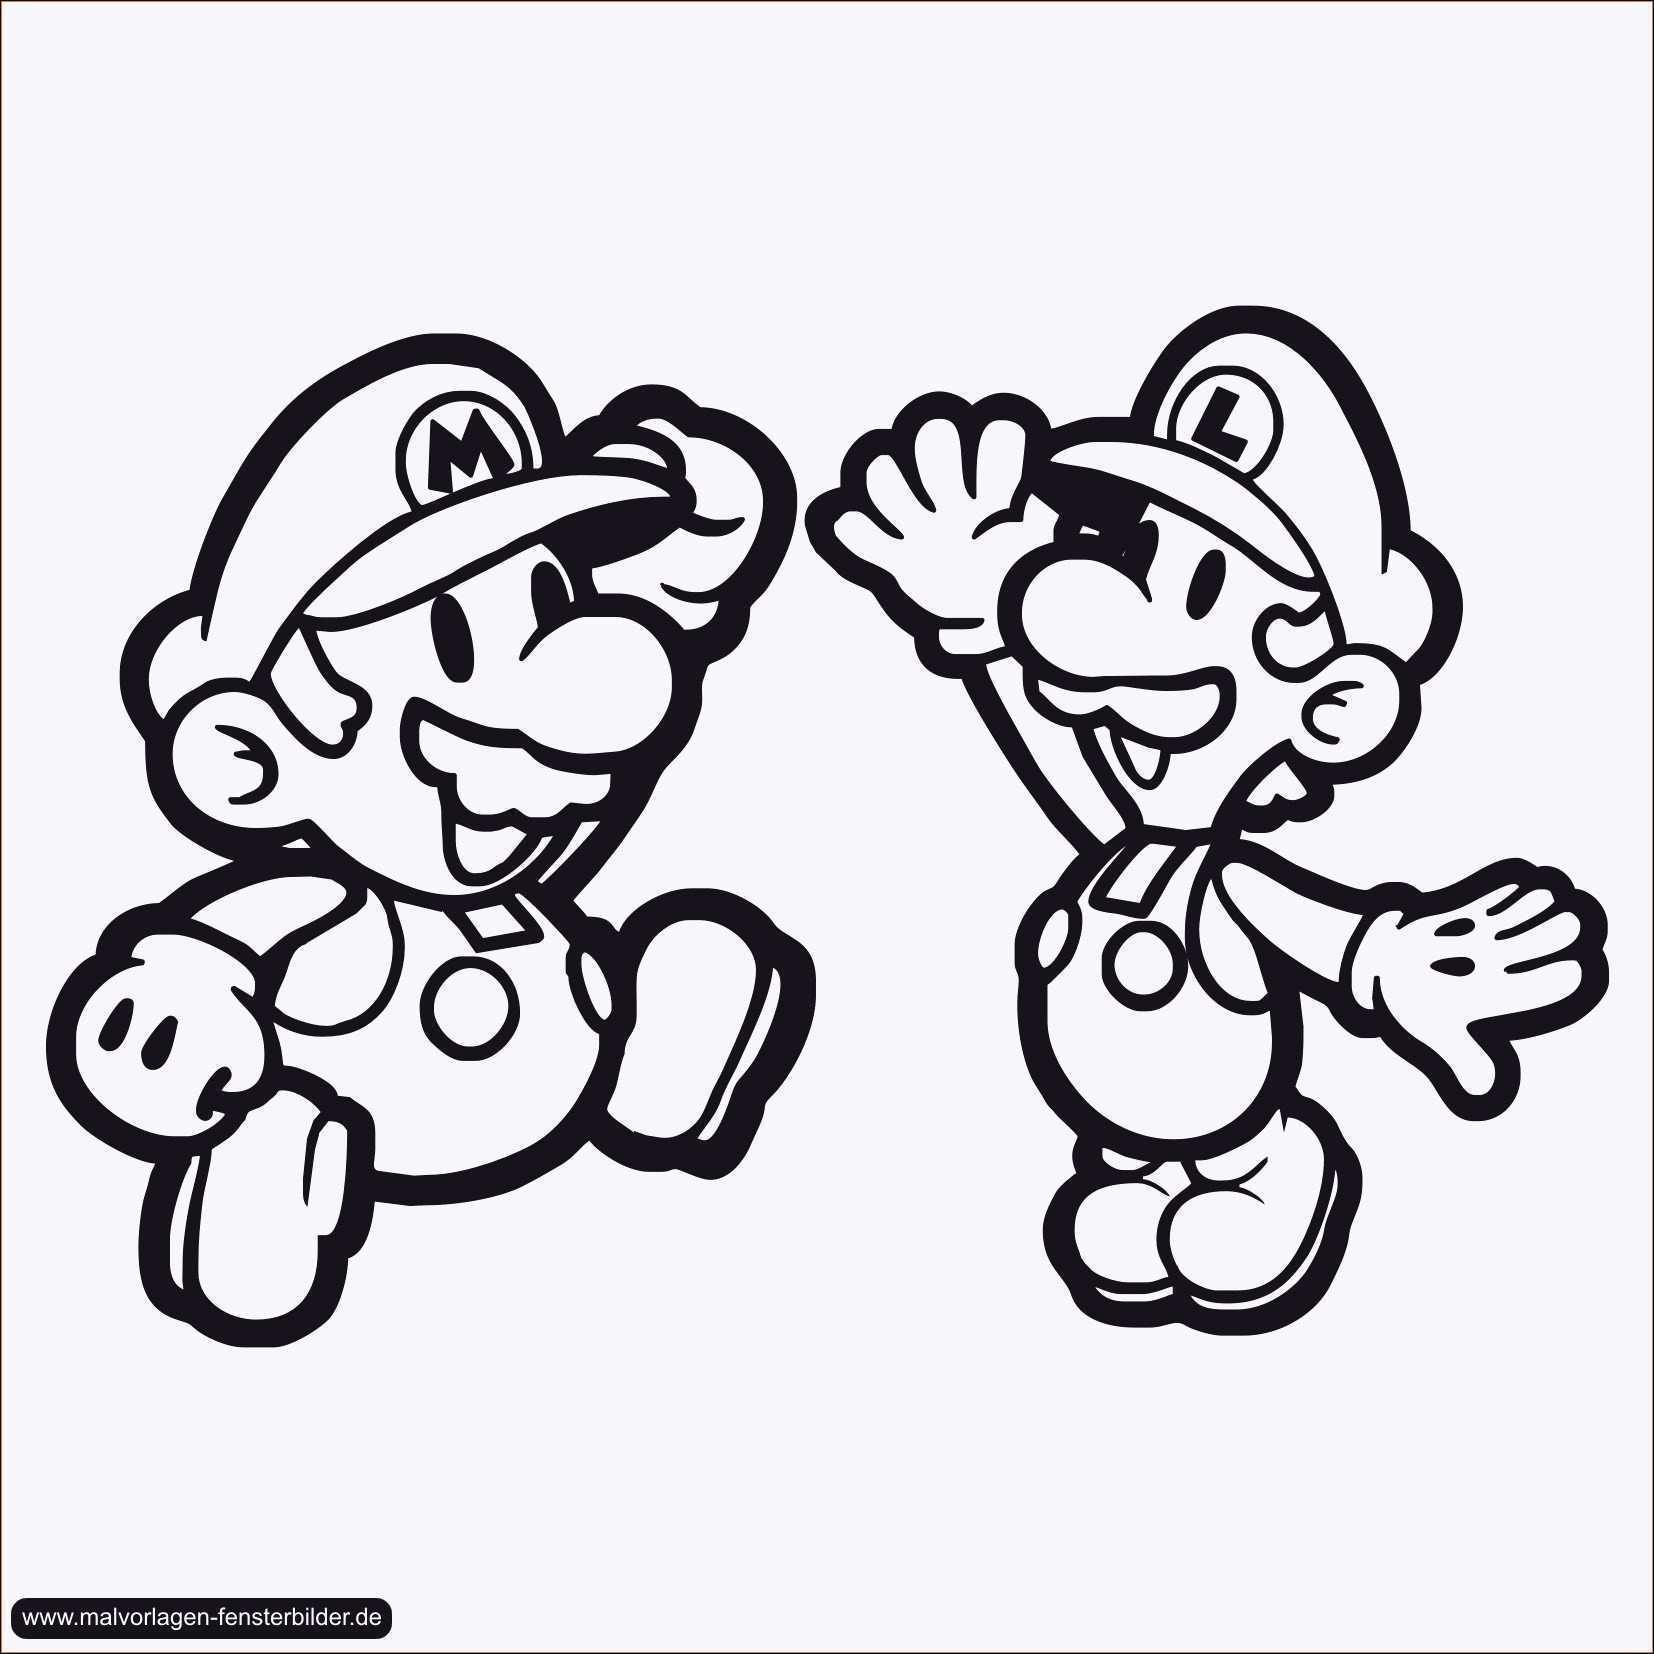 Super Mario Pilz Ausmalbilder Inspirierend Super Mario Pilz Ausmalbilder Ebenbild Malvorlagen Dino Genial Fotos